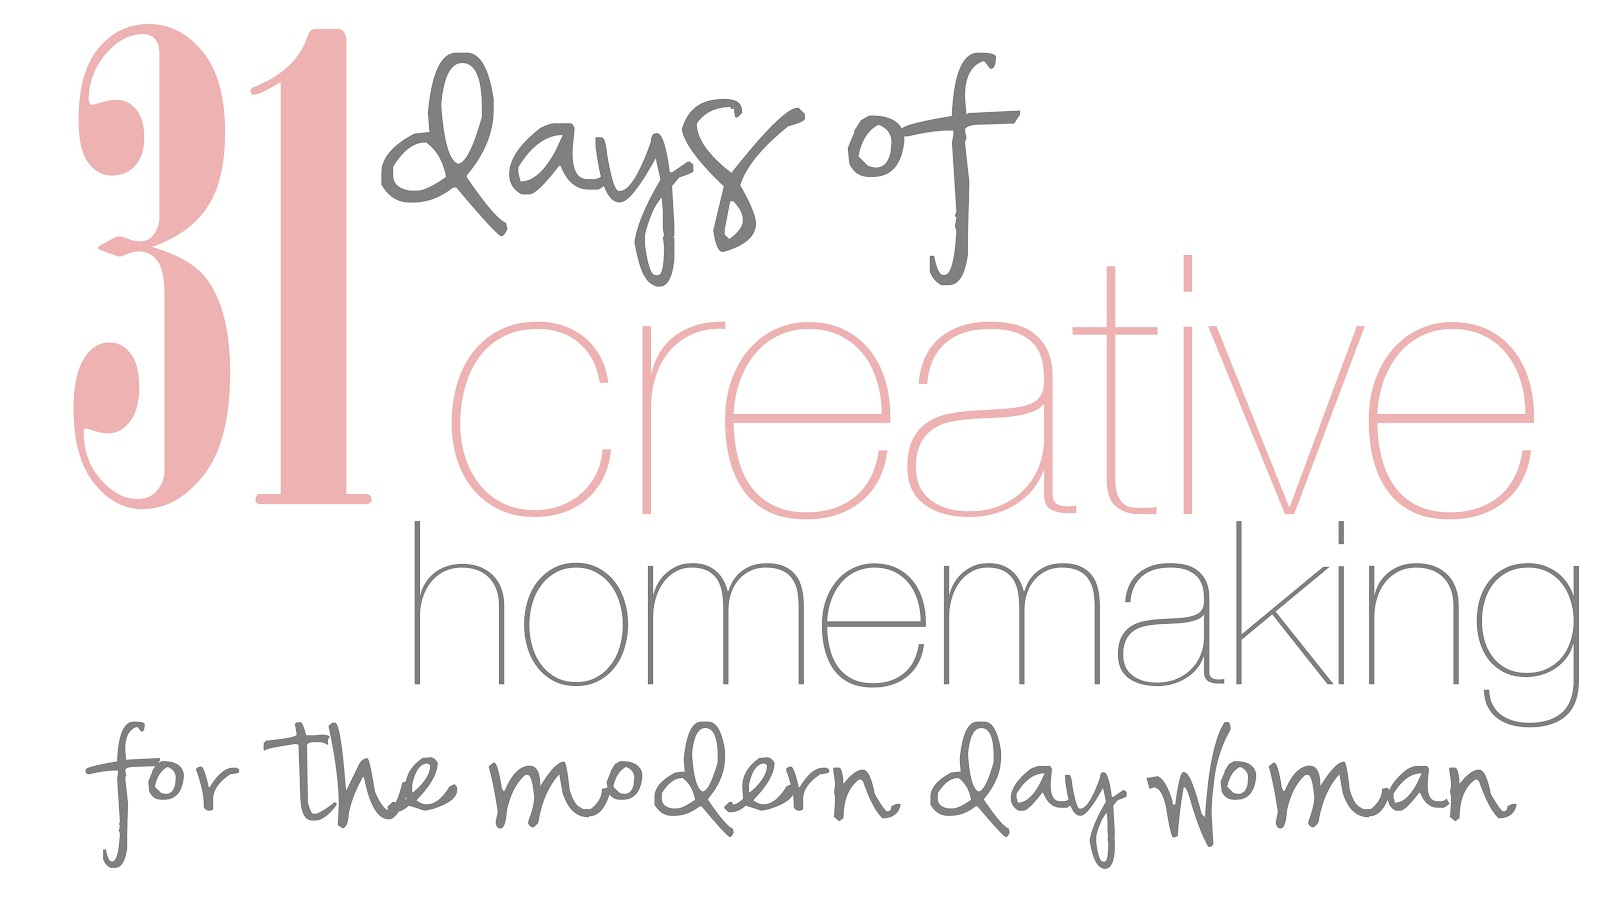 Domestic Fashionista 31 Days Of Creative Homemaking